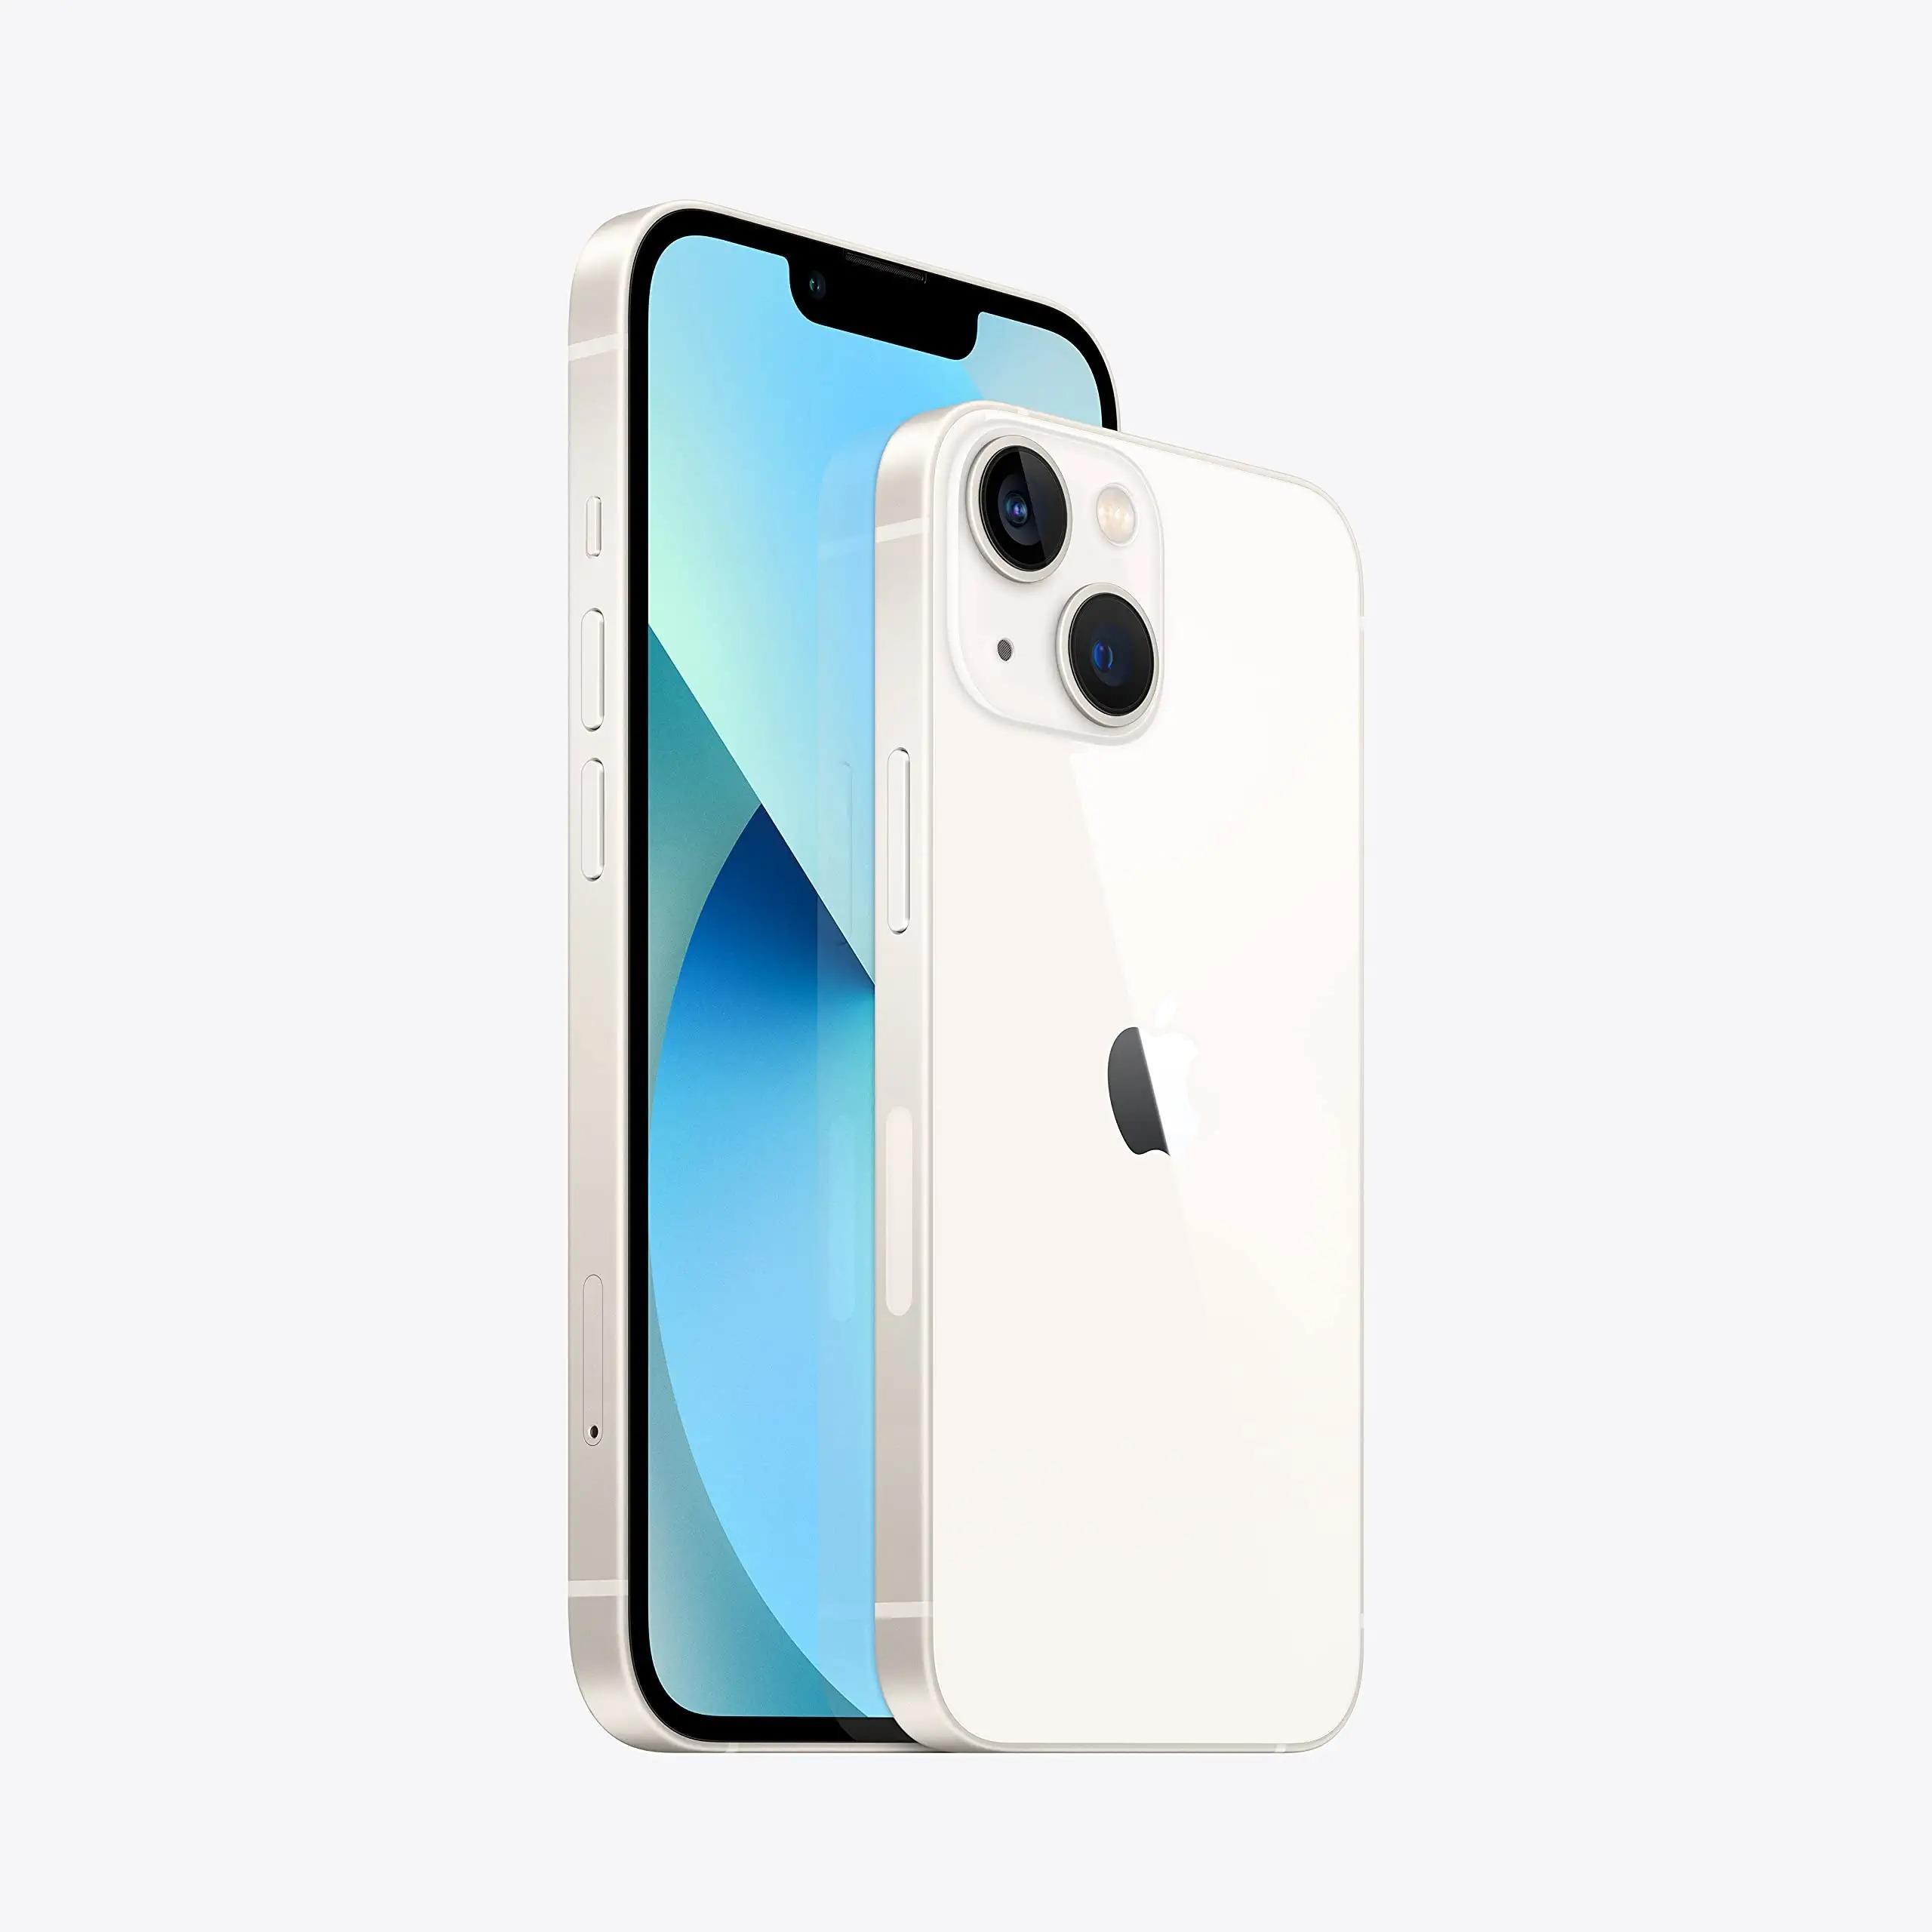 Apple iPhone 13 2